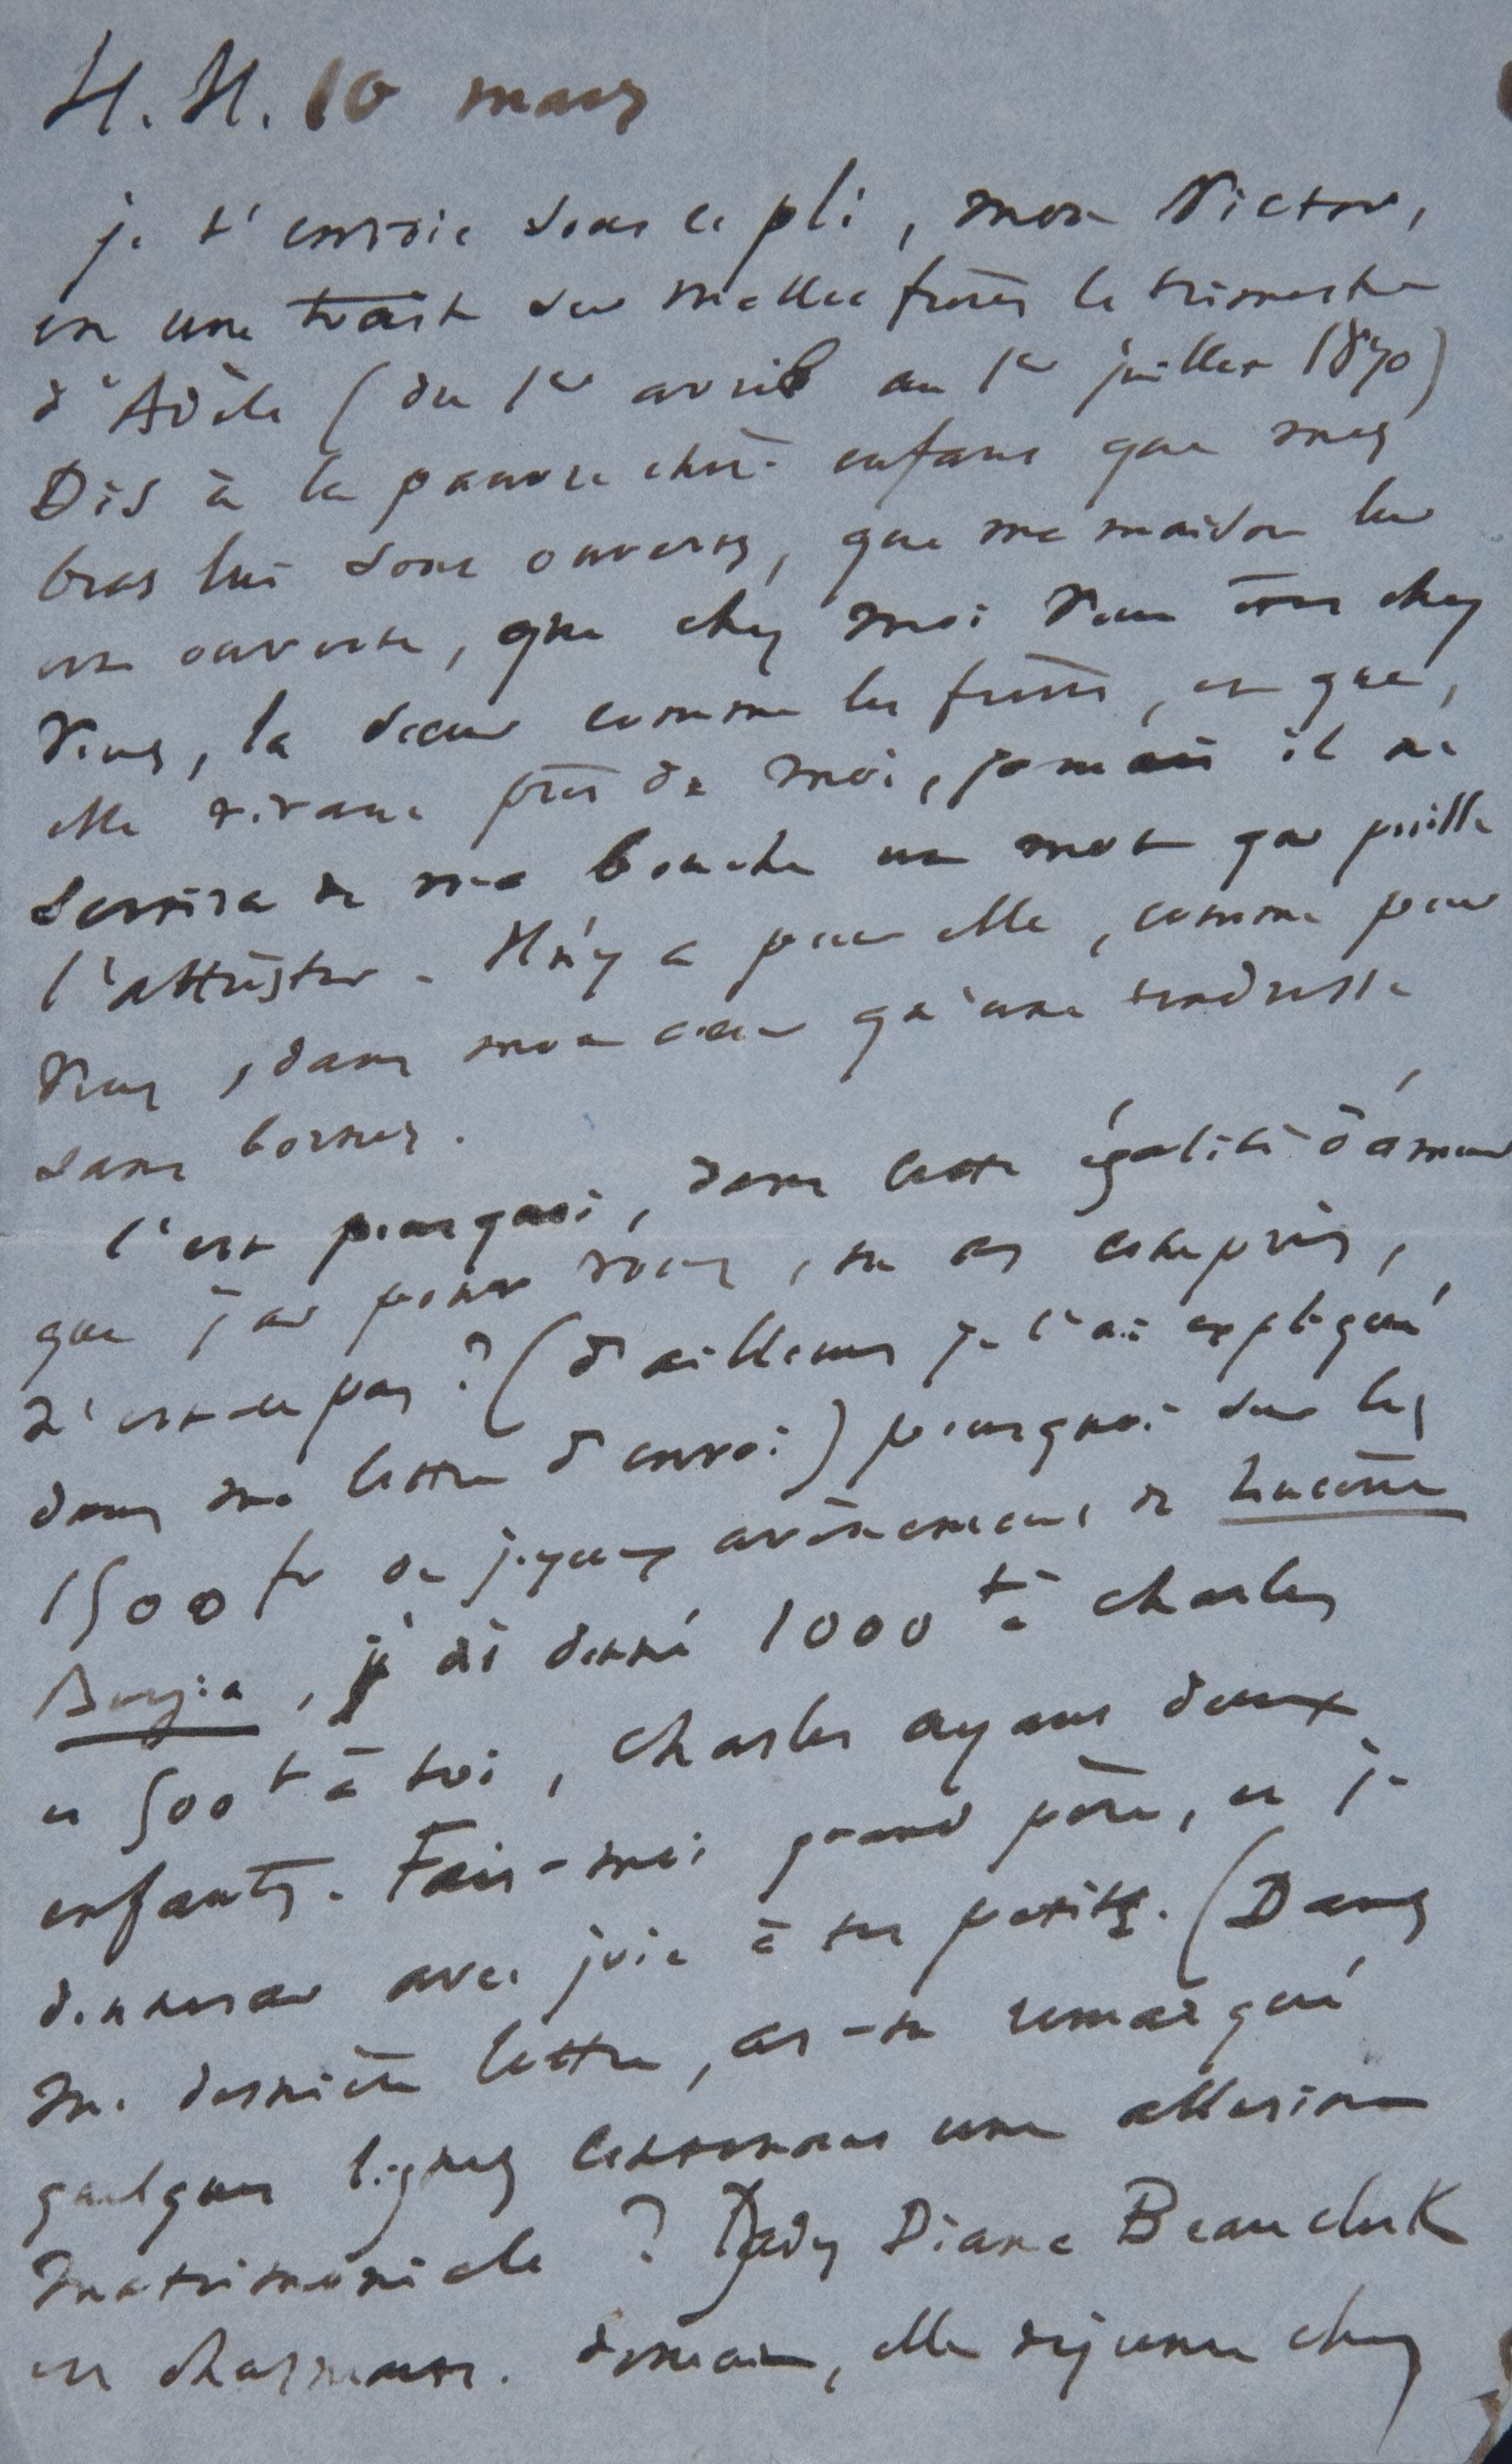 Victor Hugo Lettre Autographe Non Signee Adressee A Son Fils